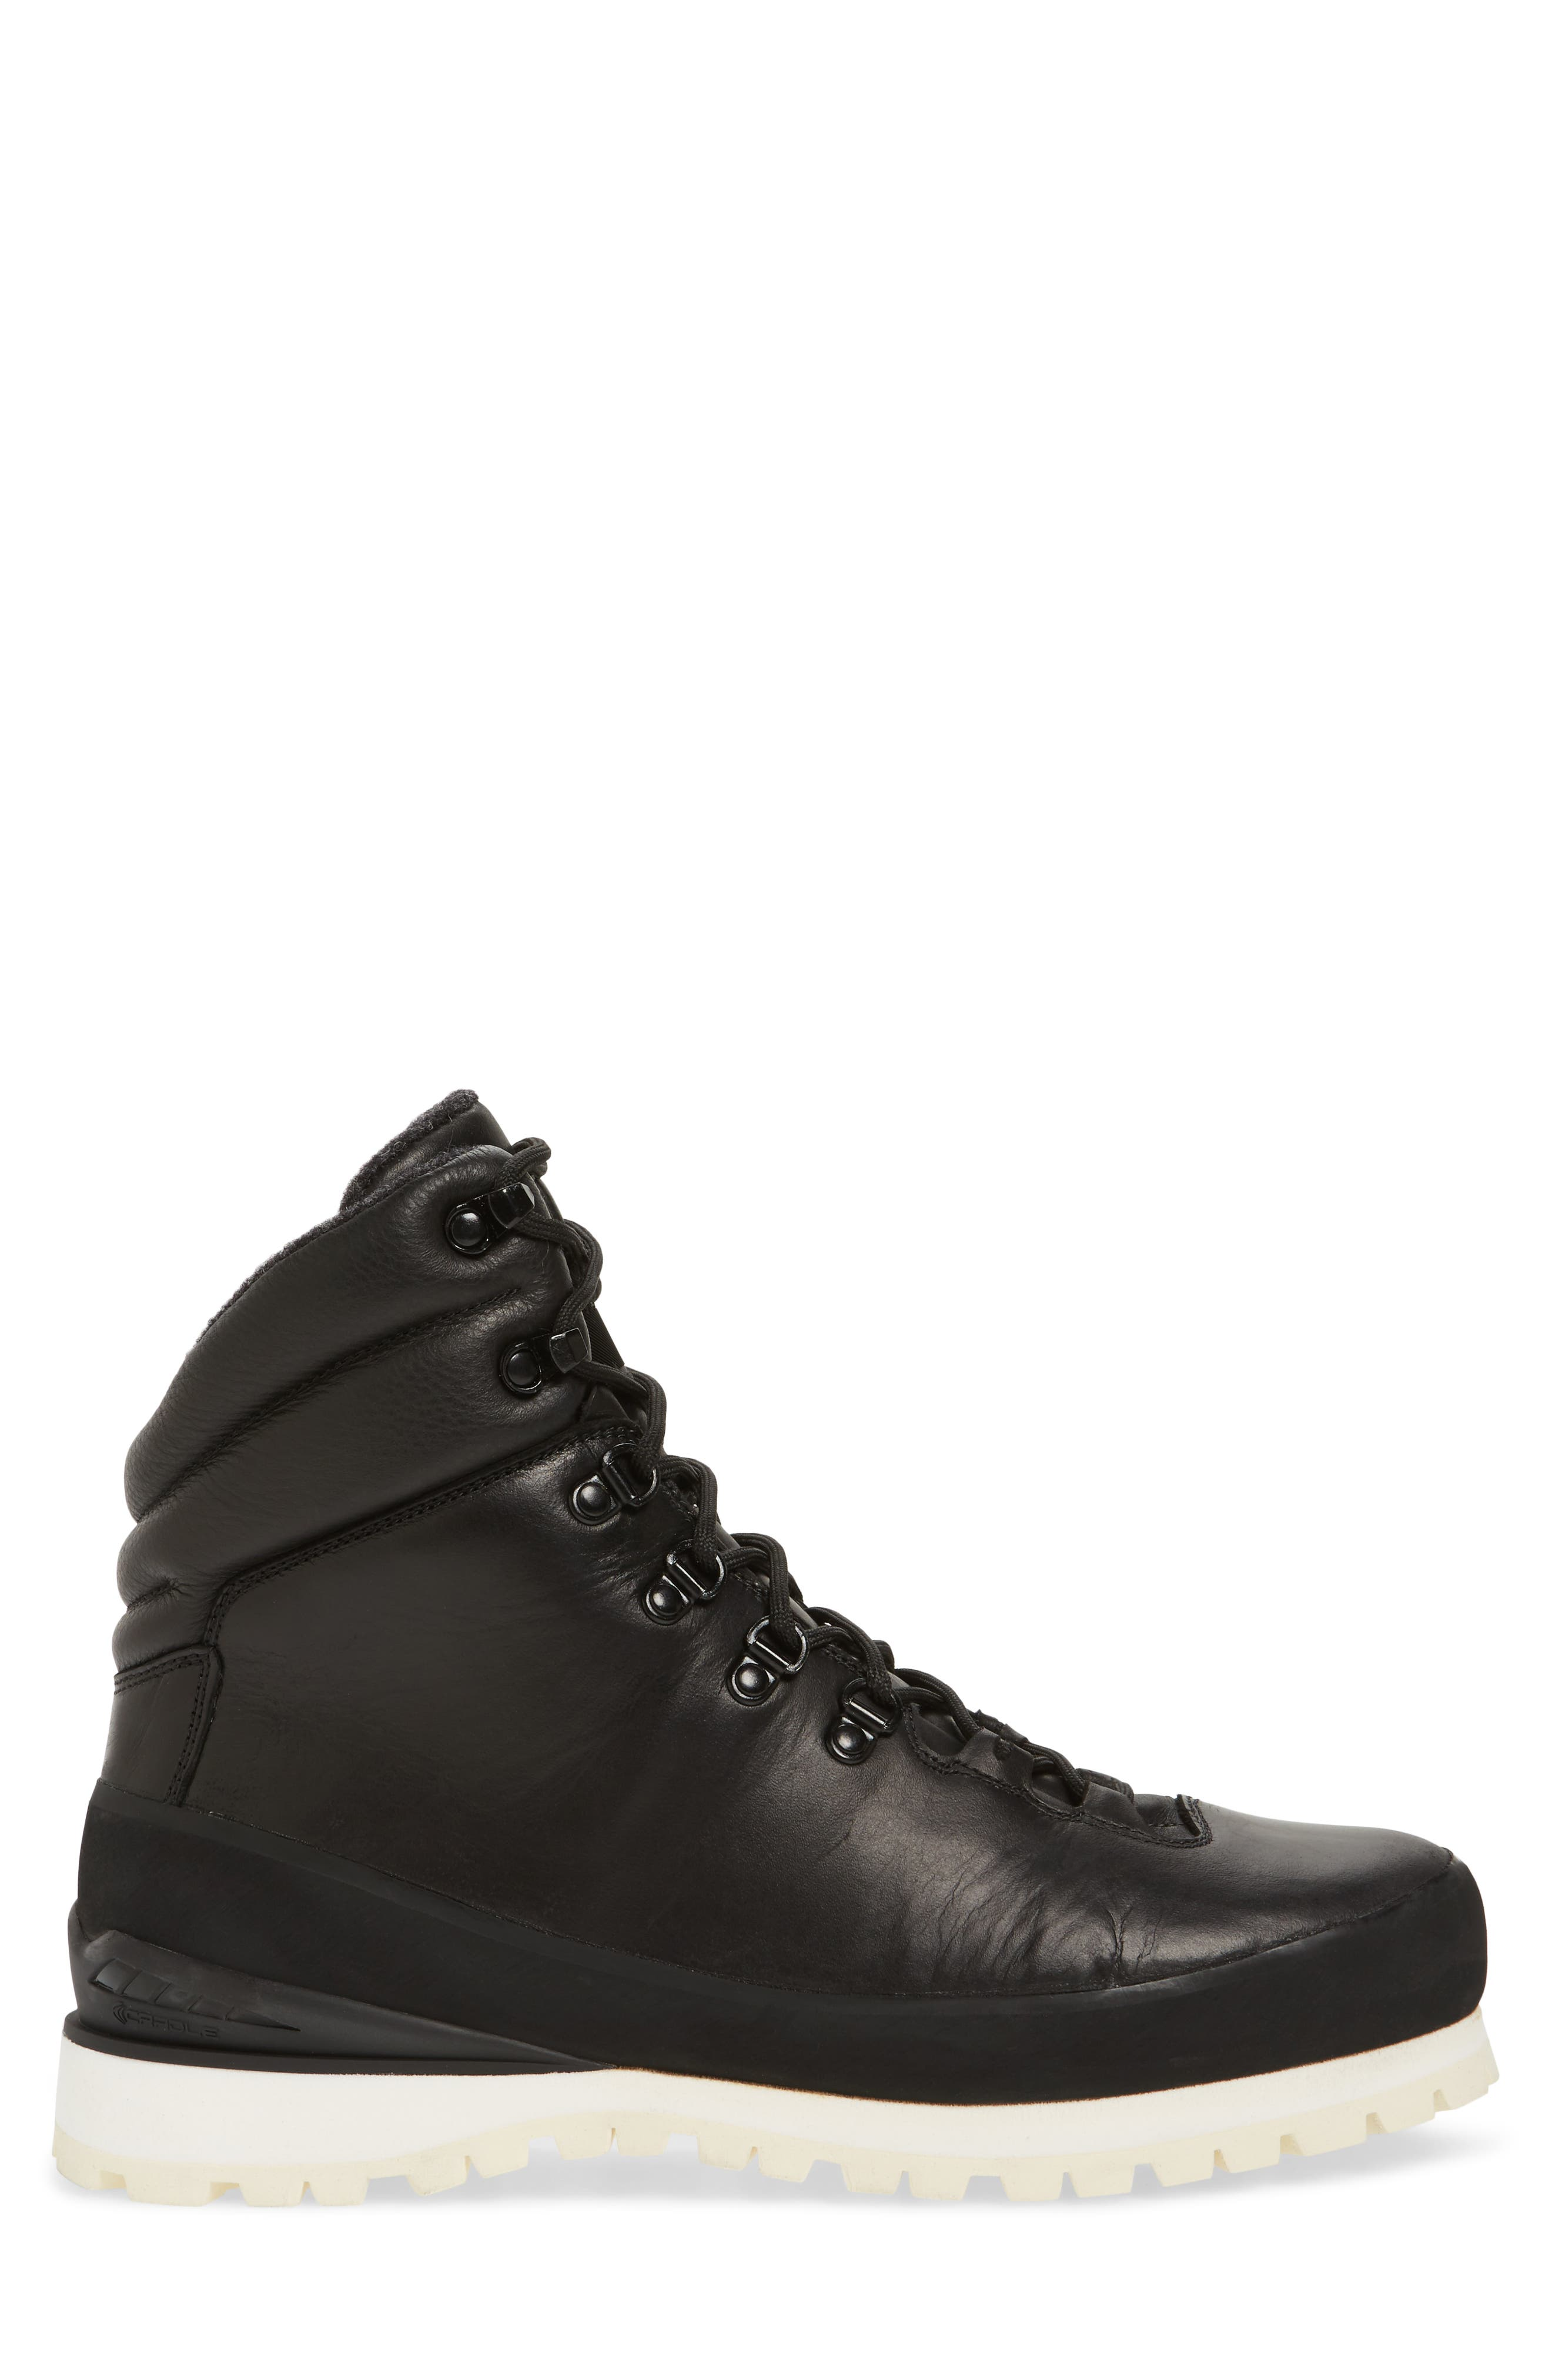 Cryos Hiker Boot,                             Alternate thumbnail 3, color,                             TNF BLACK/ TNF WHITE